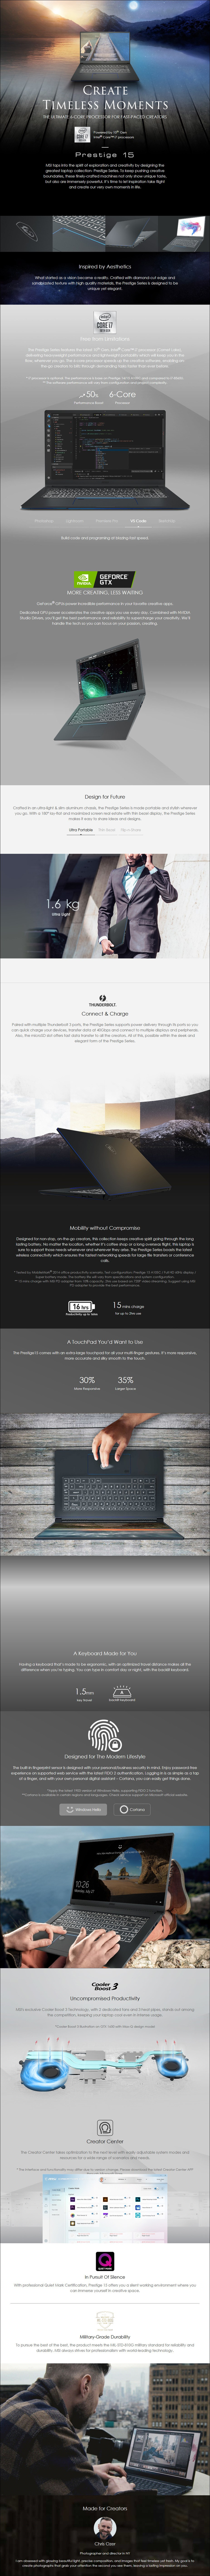 "MSI Prestige 15 A10SC 15.6"" 4K Laptop i7-10710U 16GB 1TB GTX1650 W10P - Overview 1"